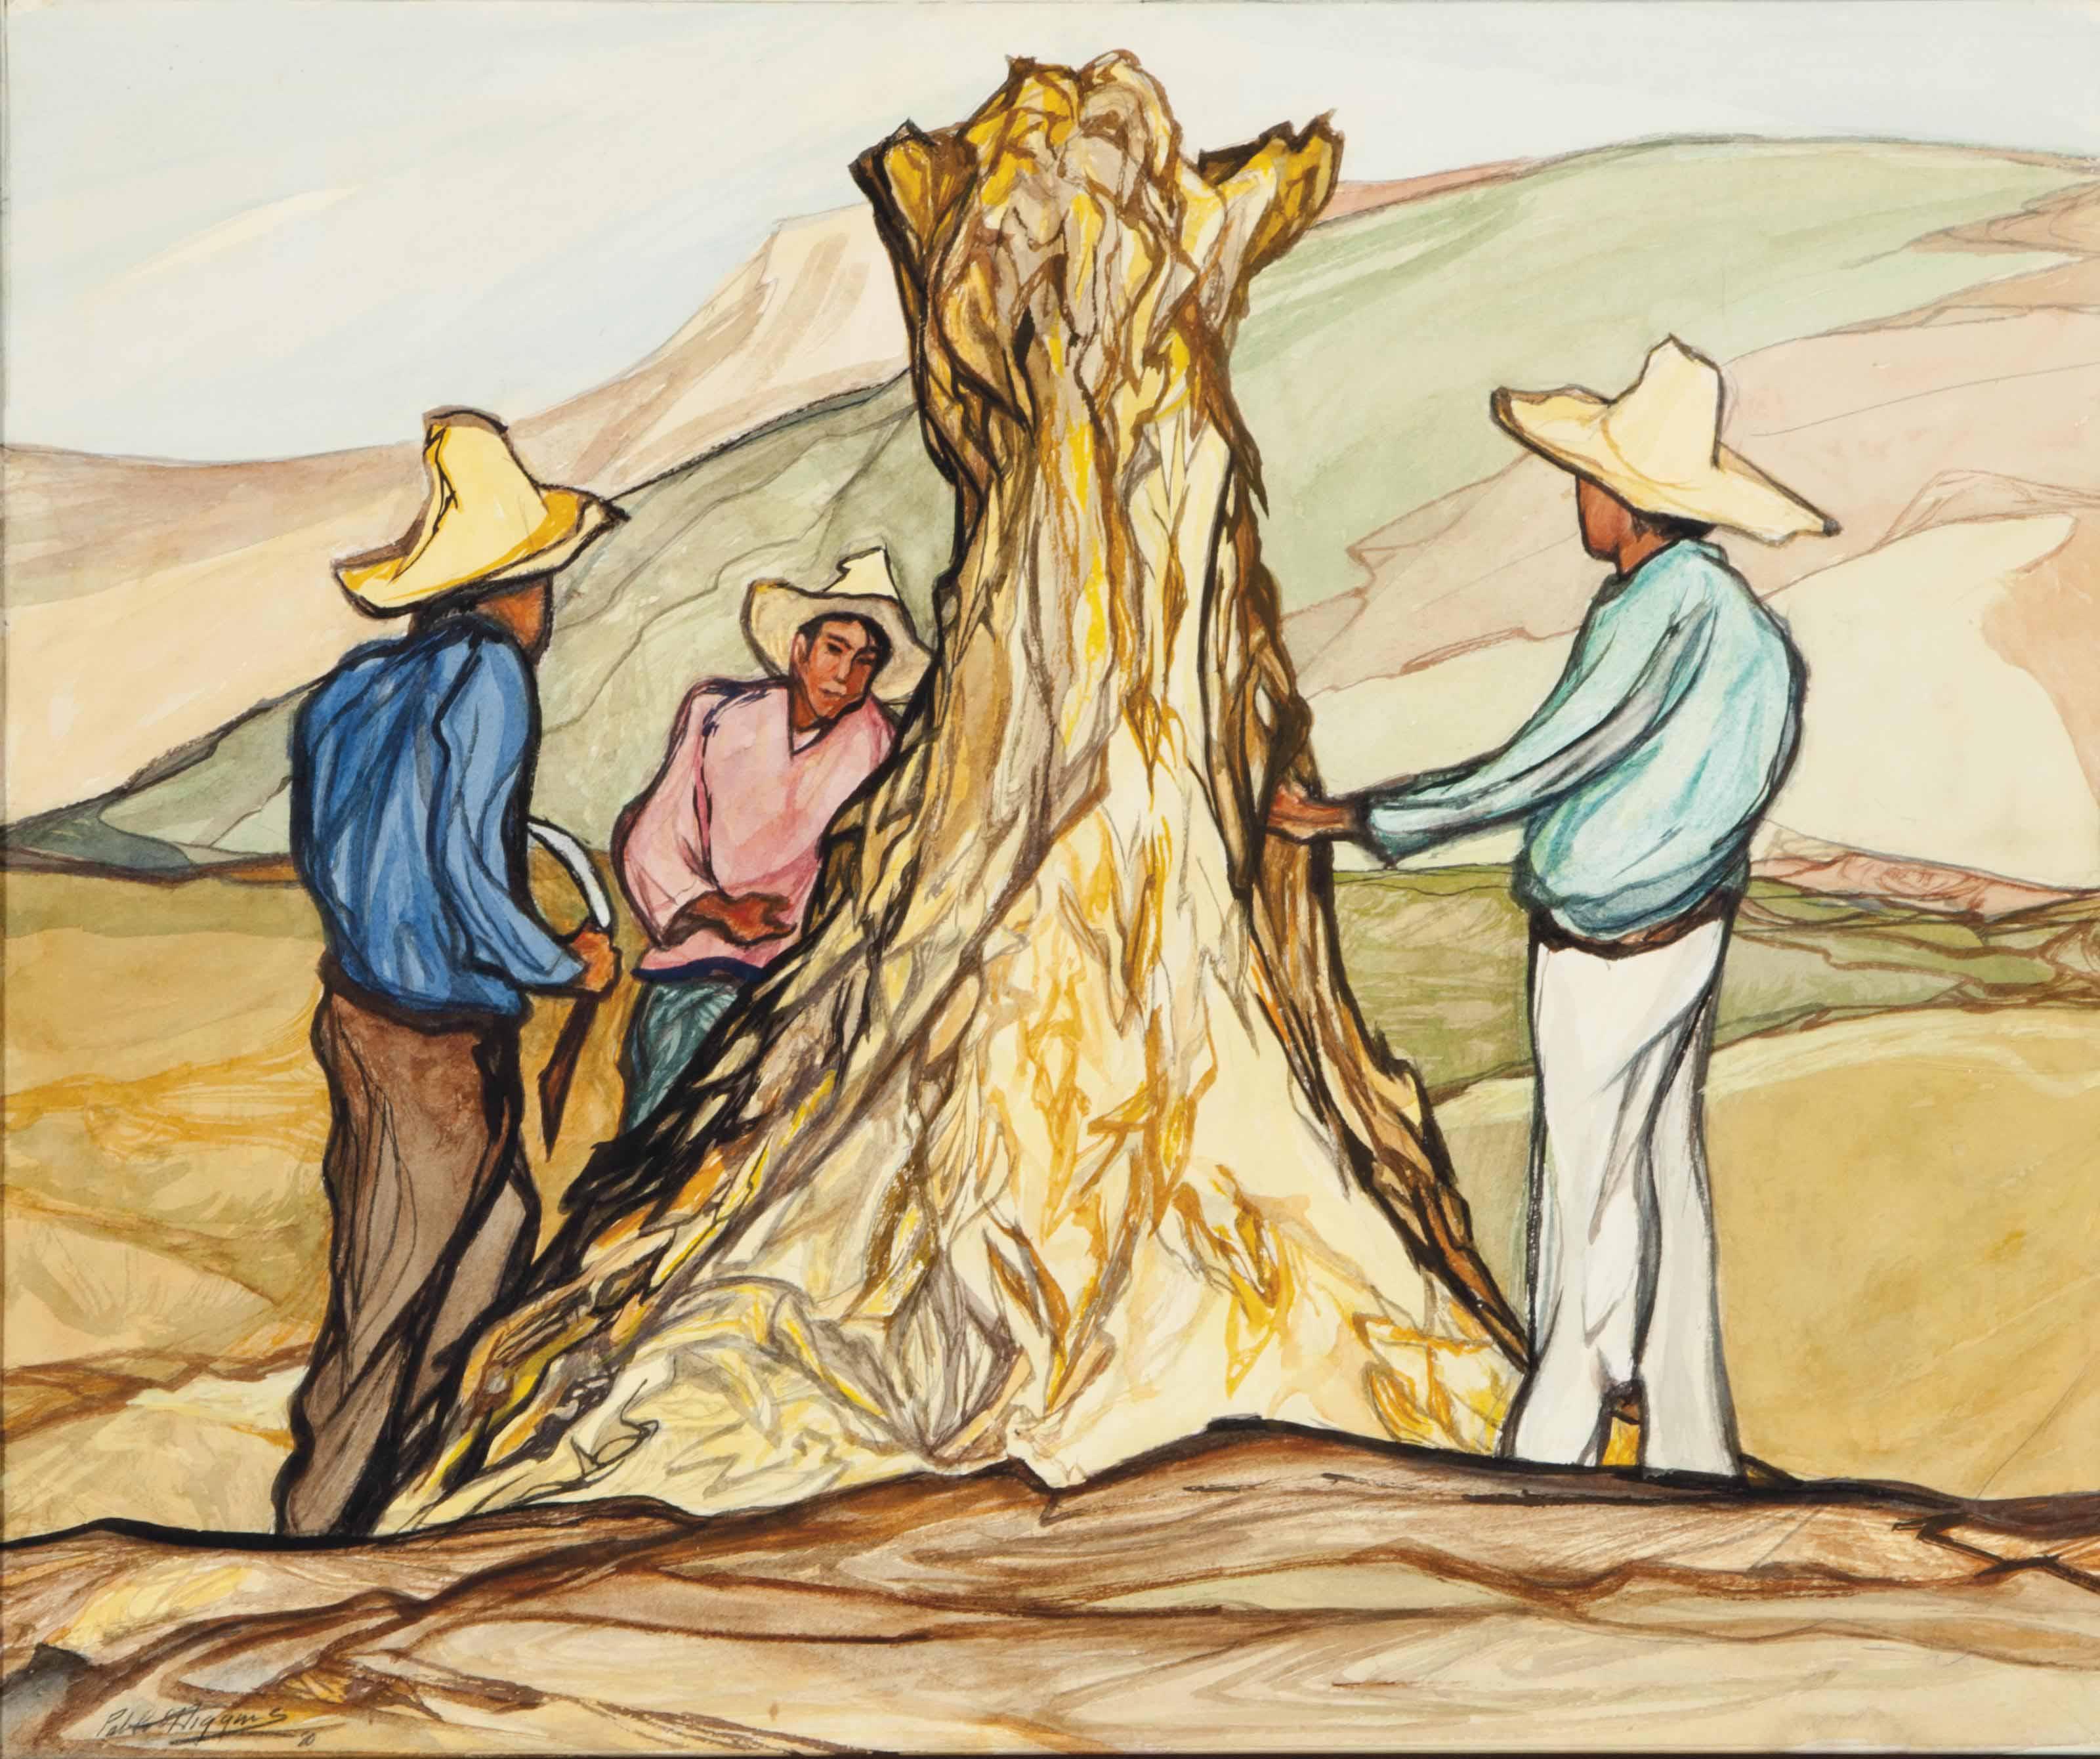 Wheat Harvesters